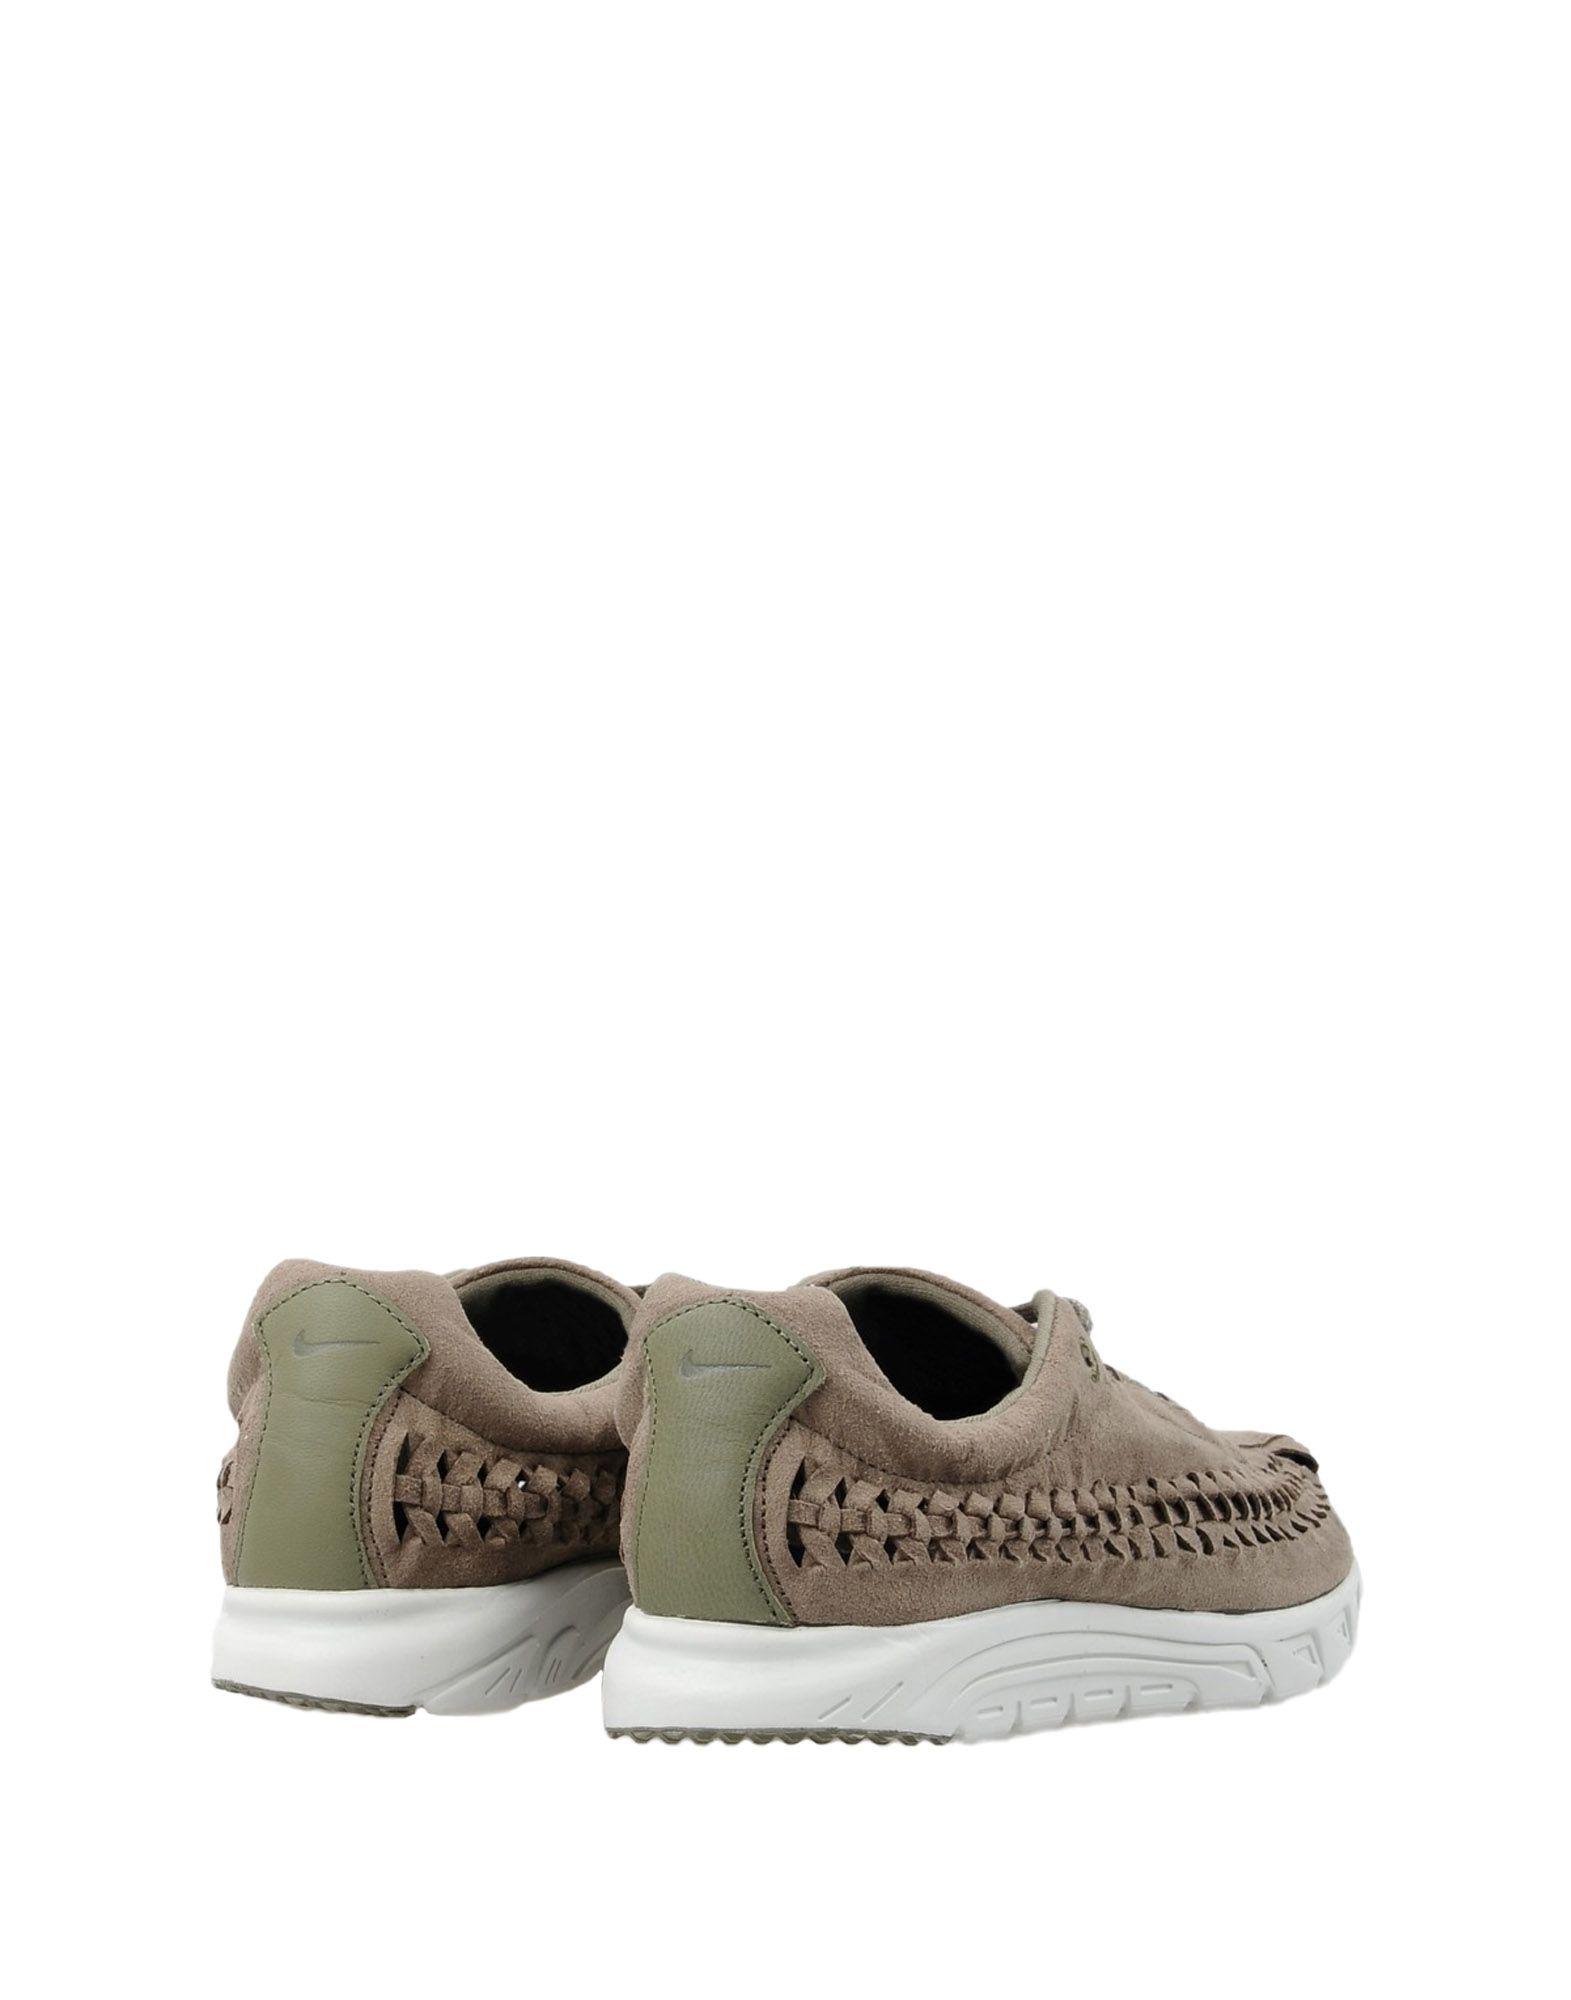 Scarpe da Ginnastica Nike    Mayfly Woven - Uomo - 11287553HG 35630e